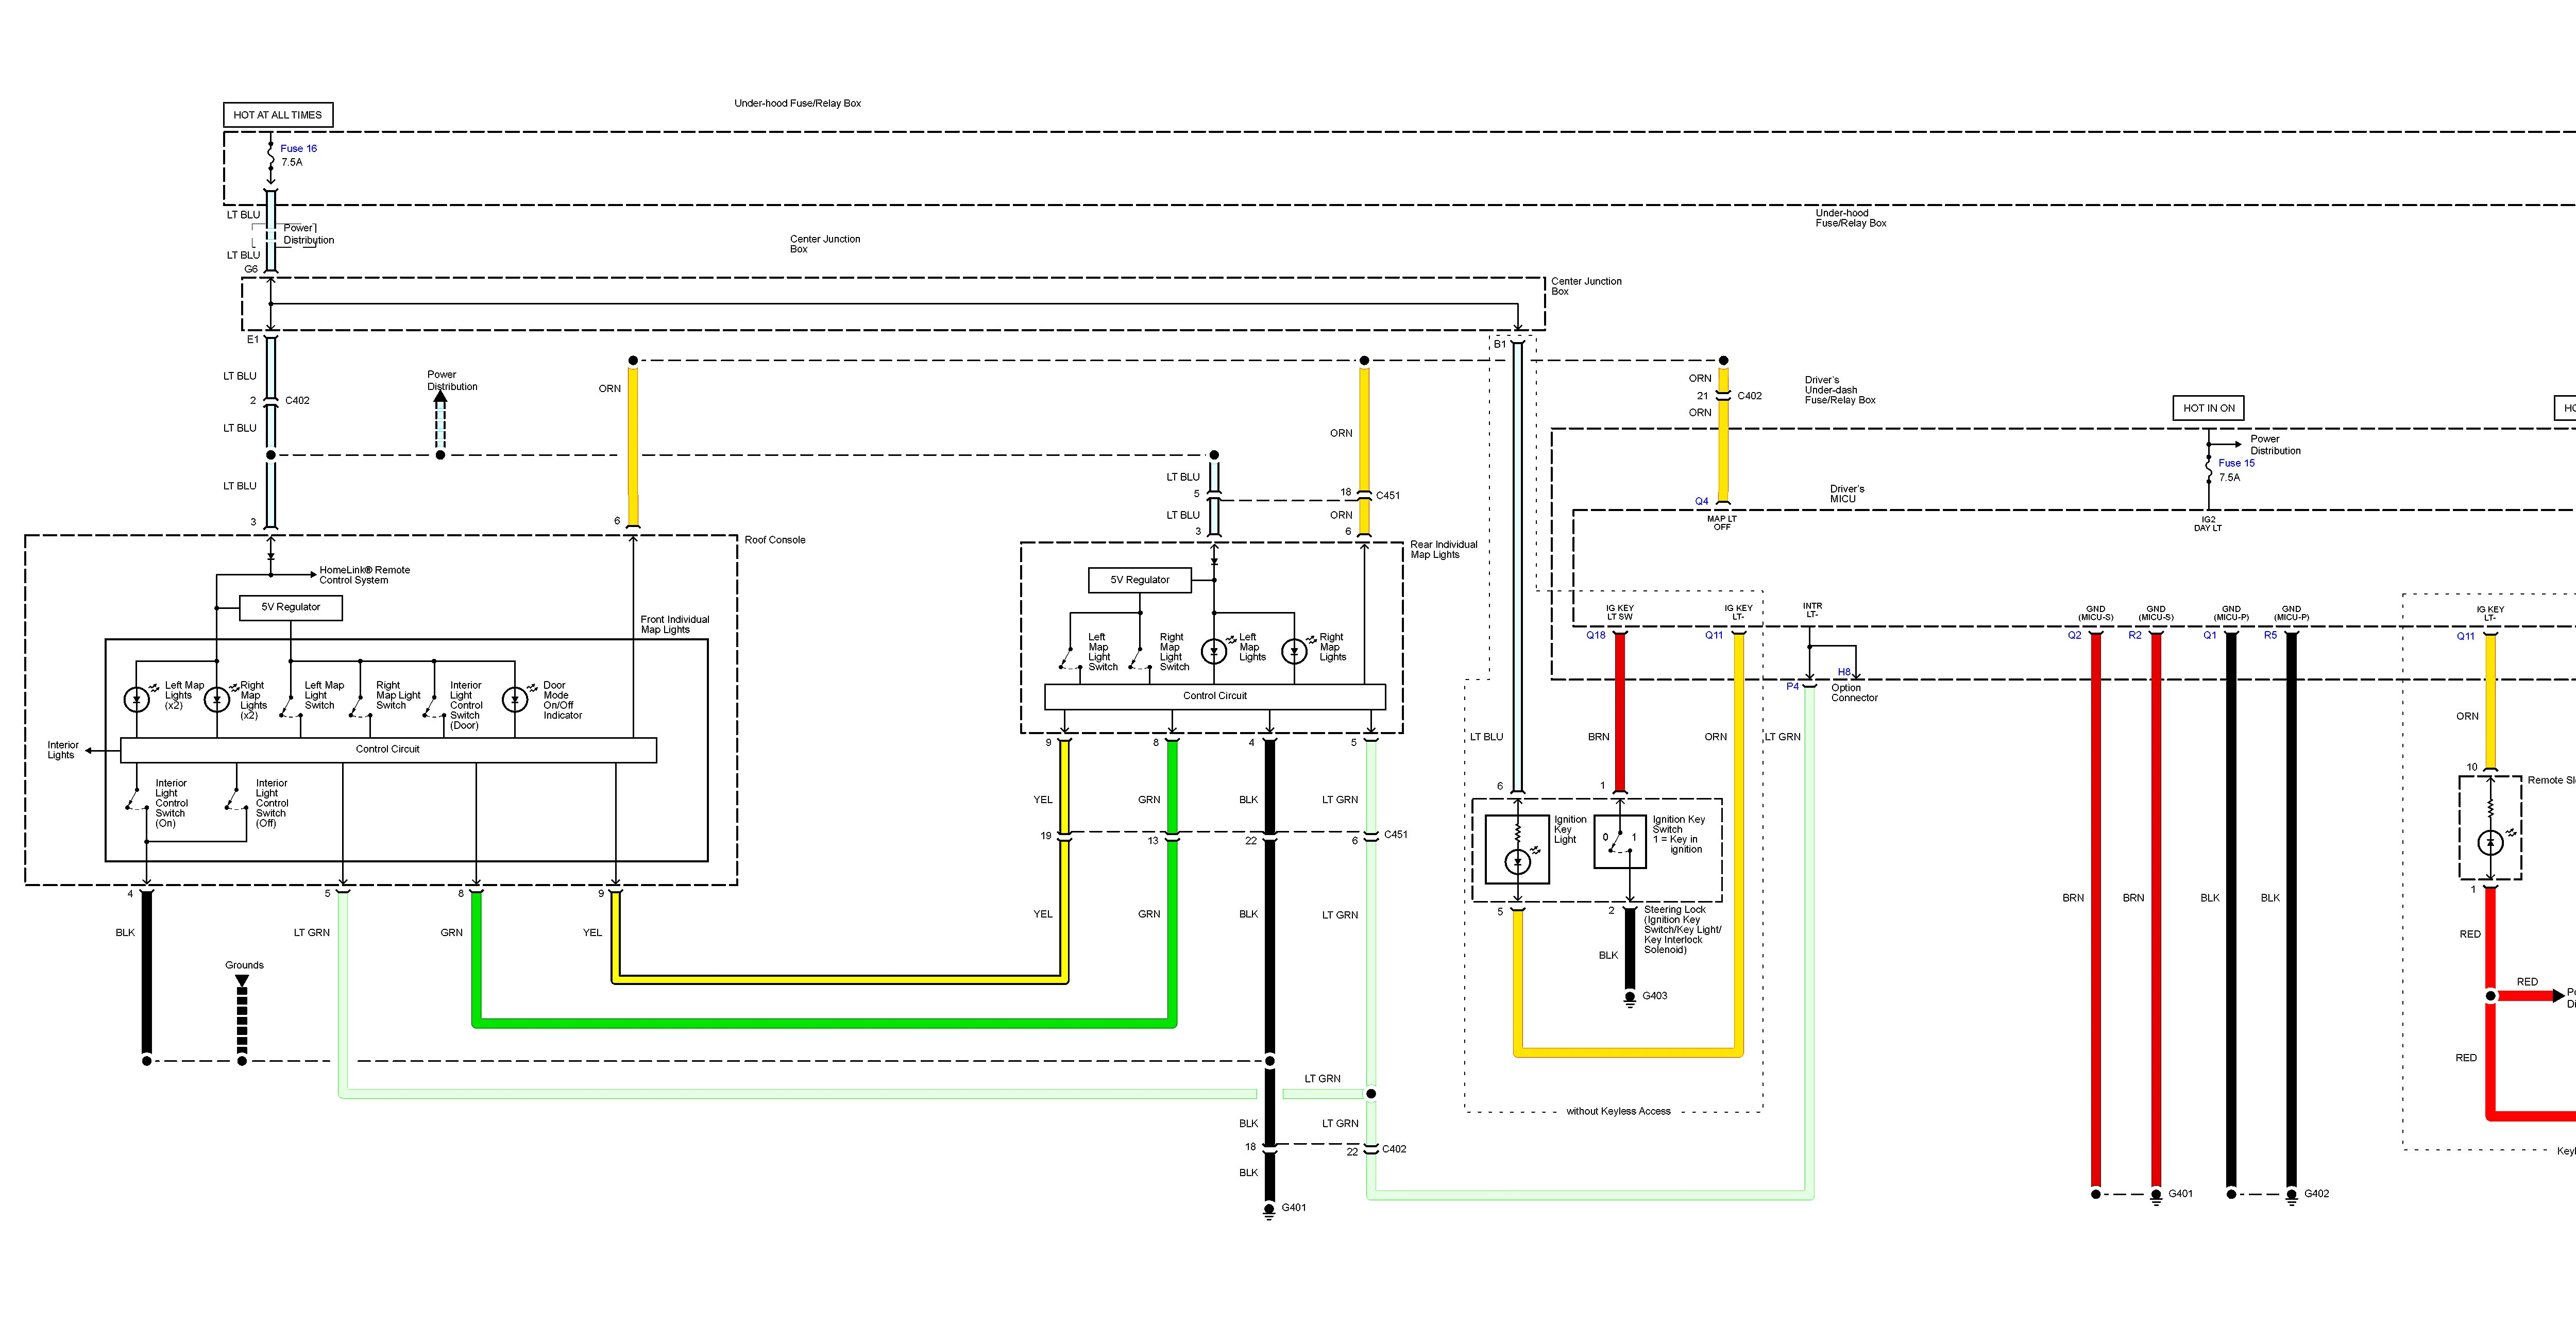 Acura Tl 2013 2014 Wiring Diagrams Lighting Control Module Diagram Part 1